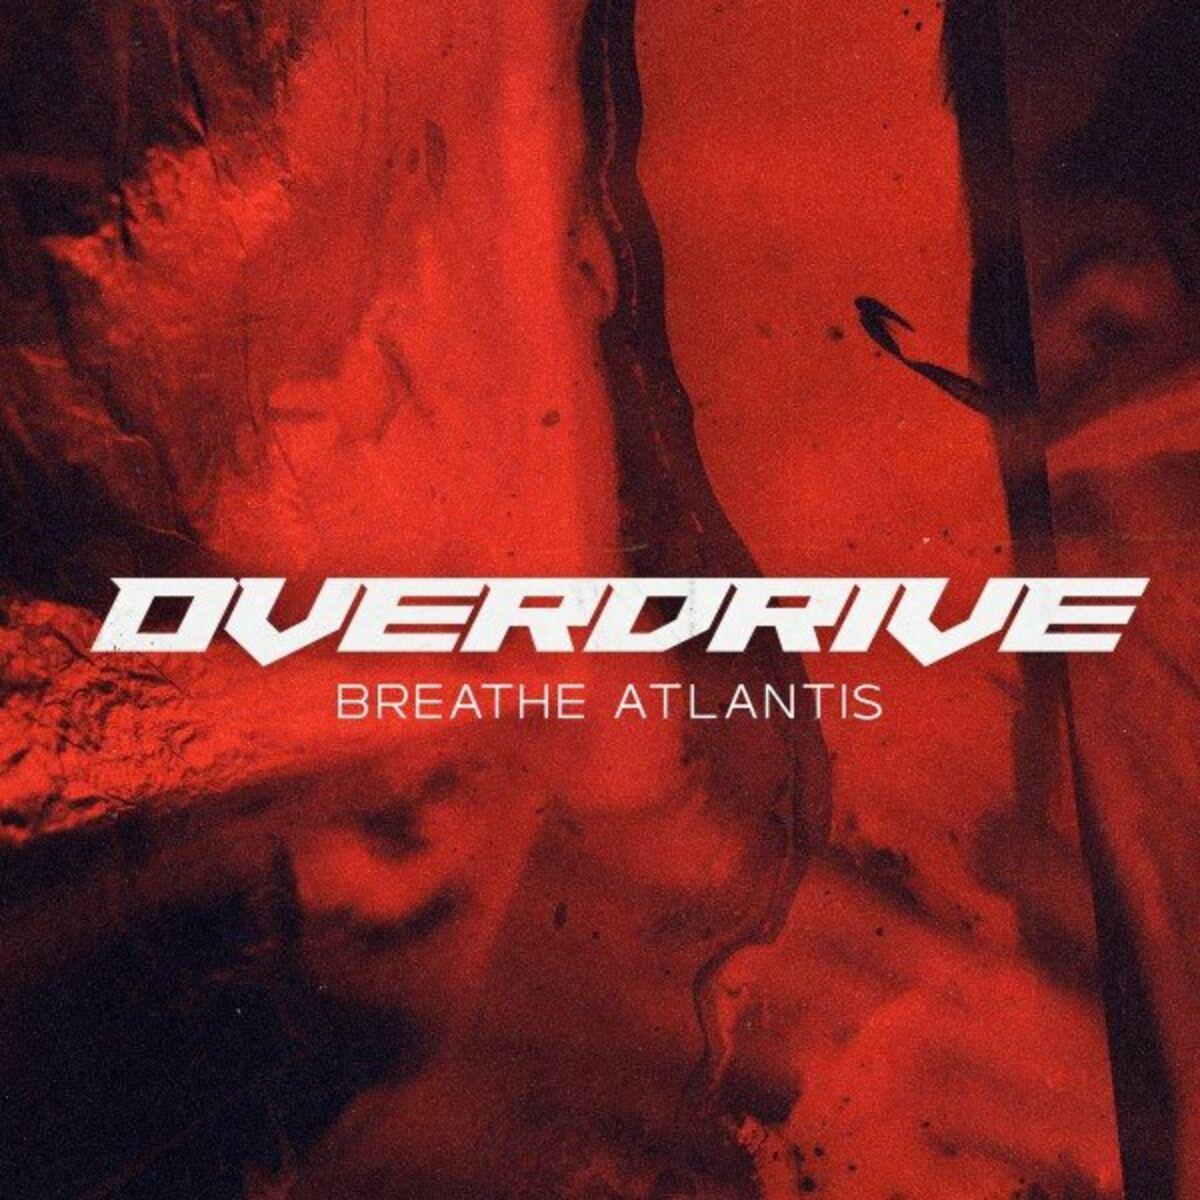 Breathe Atlantis - Overdrive [single] (2021)